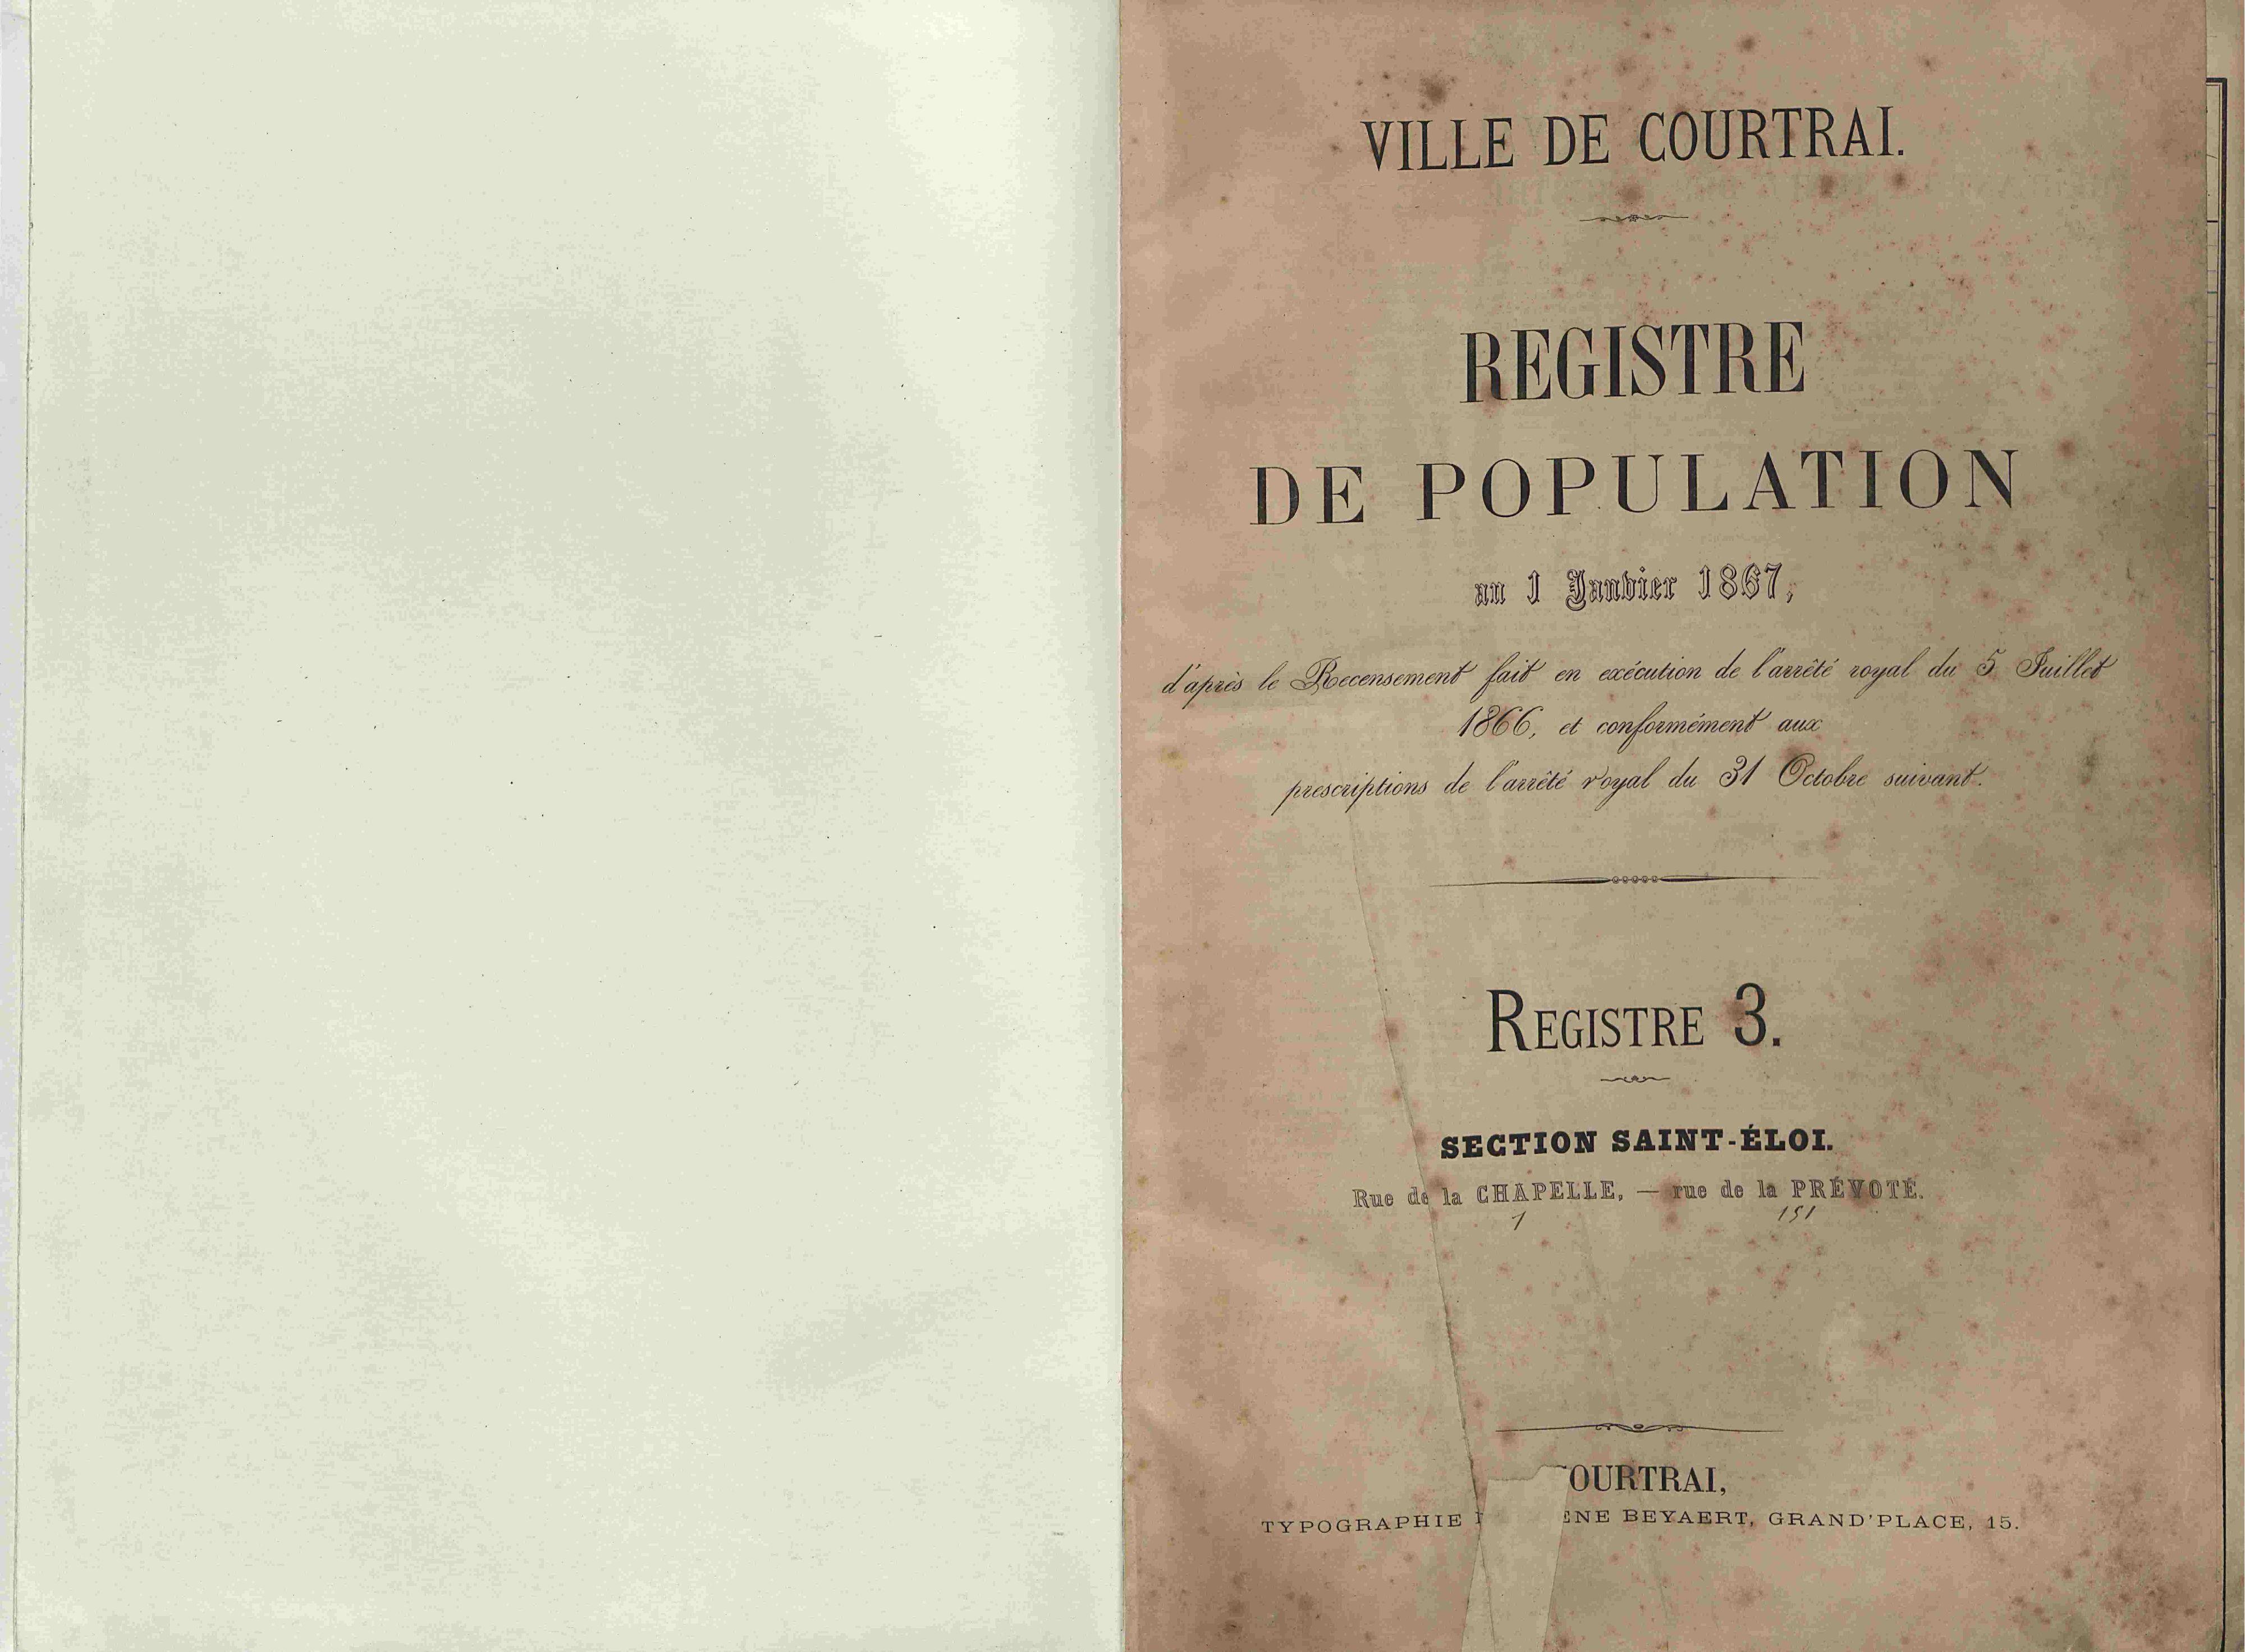 Bevolkingsregister Kortrijk 1866 boek 3